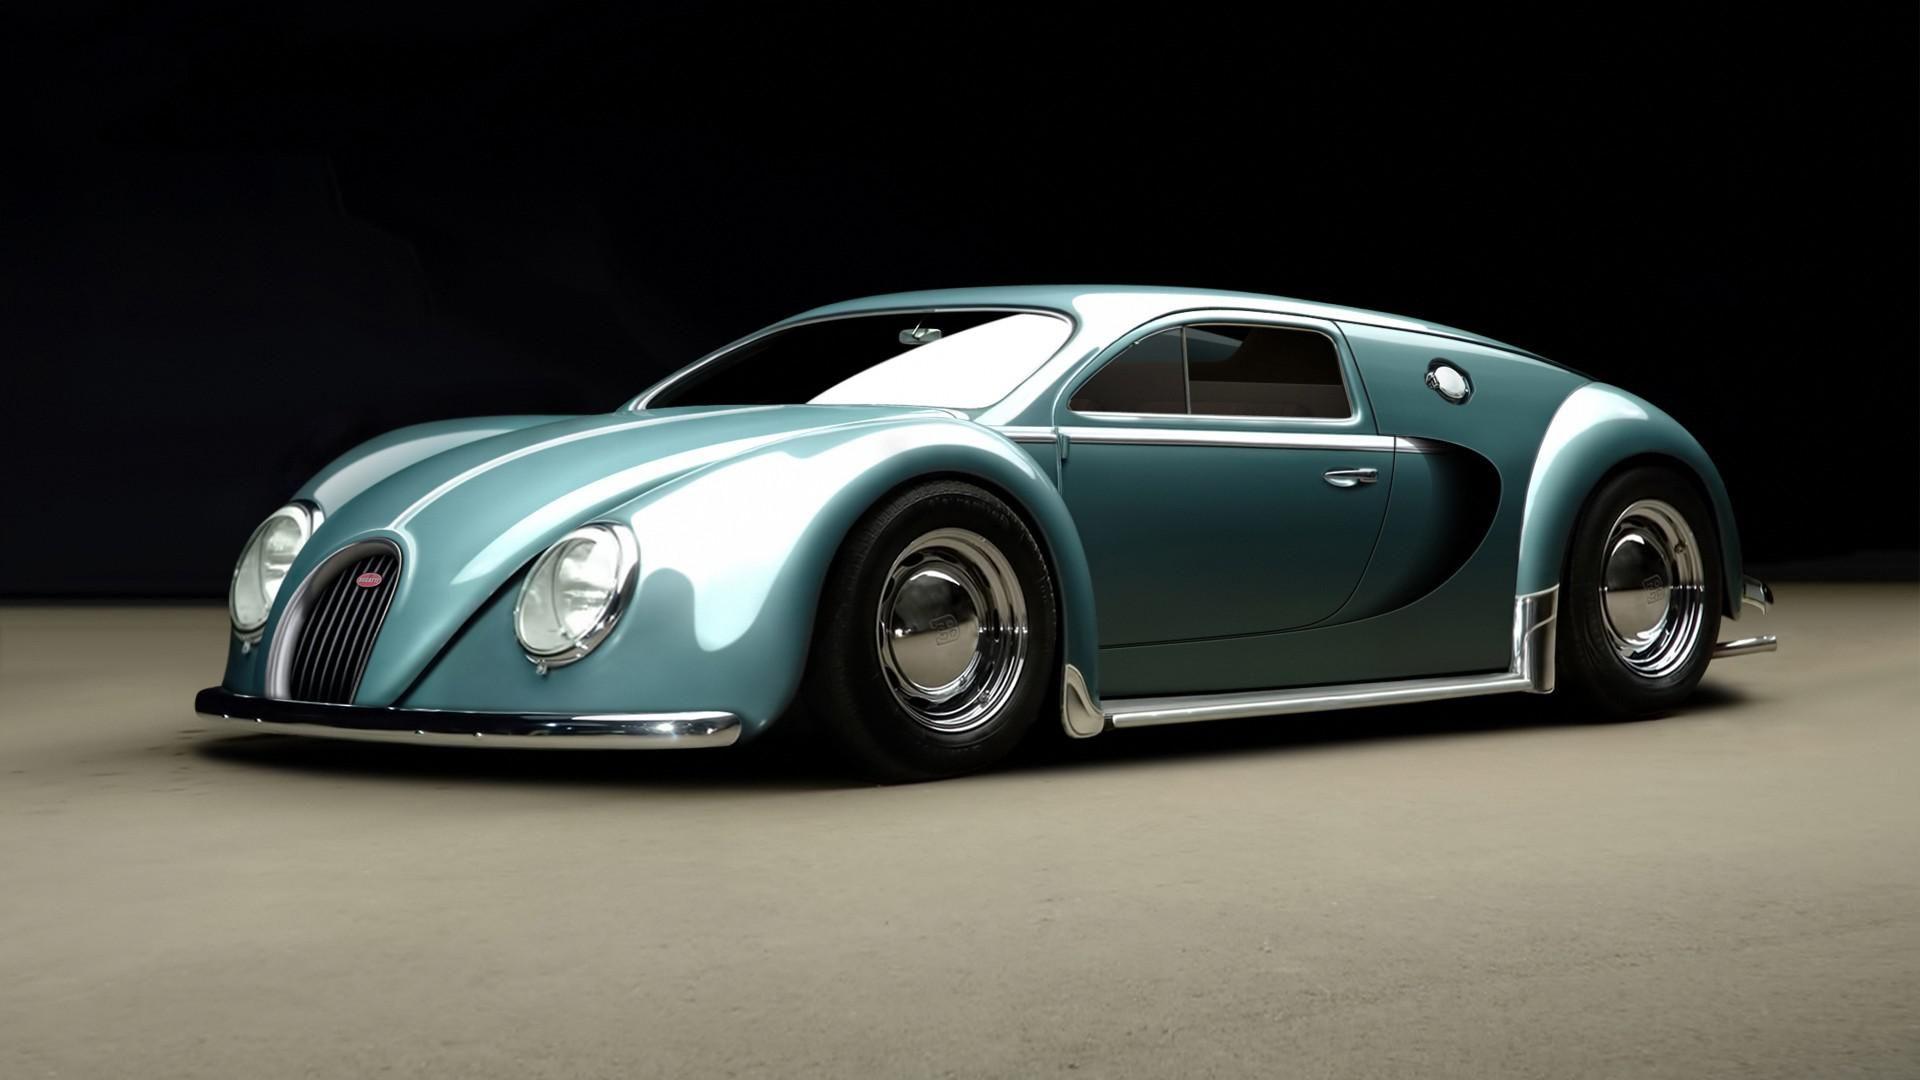 1945 Bugatti Veyron | Klasik Otomobiller | Pinterest | Bugatti ...